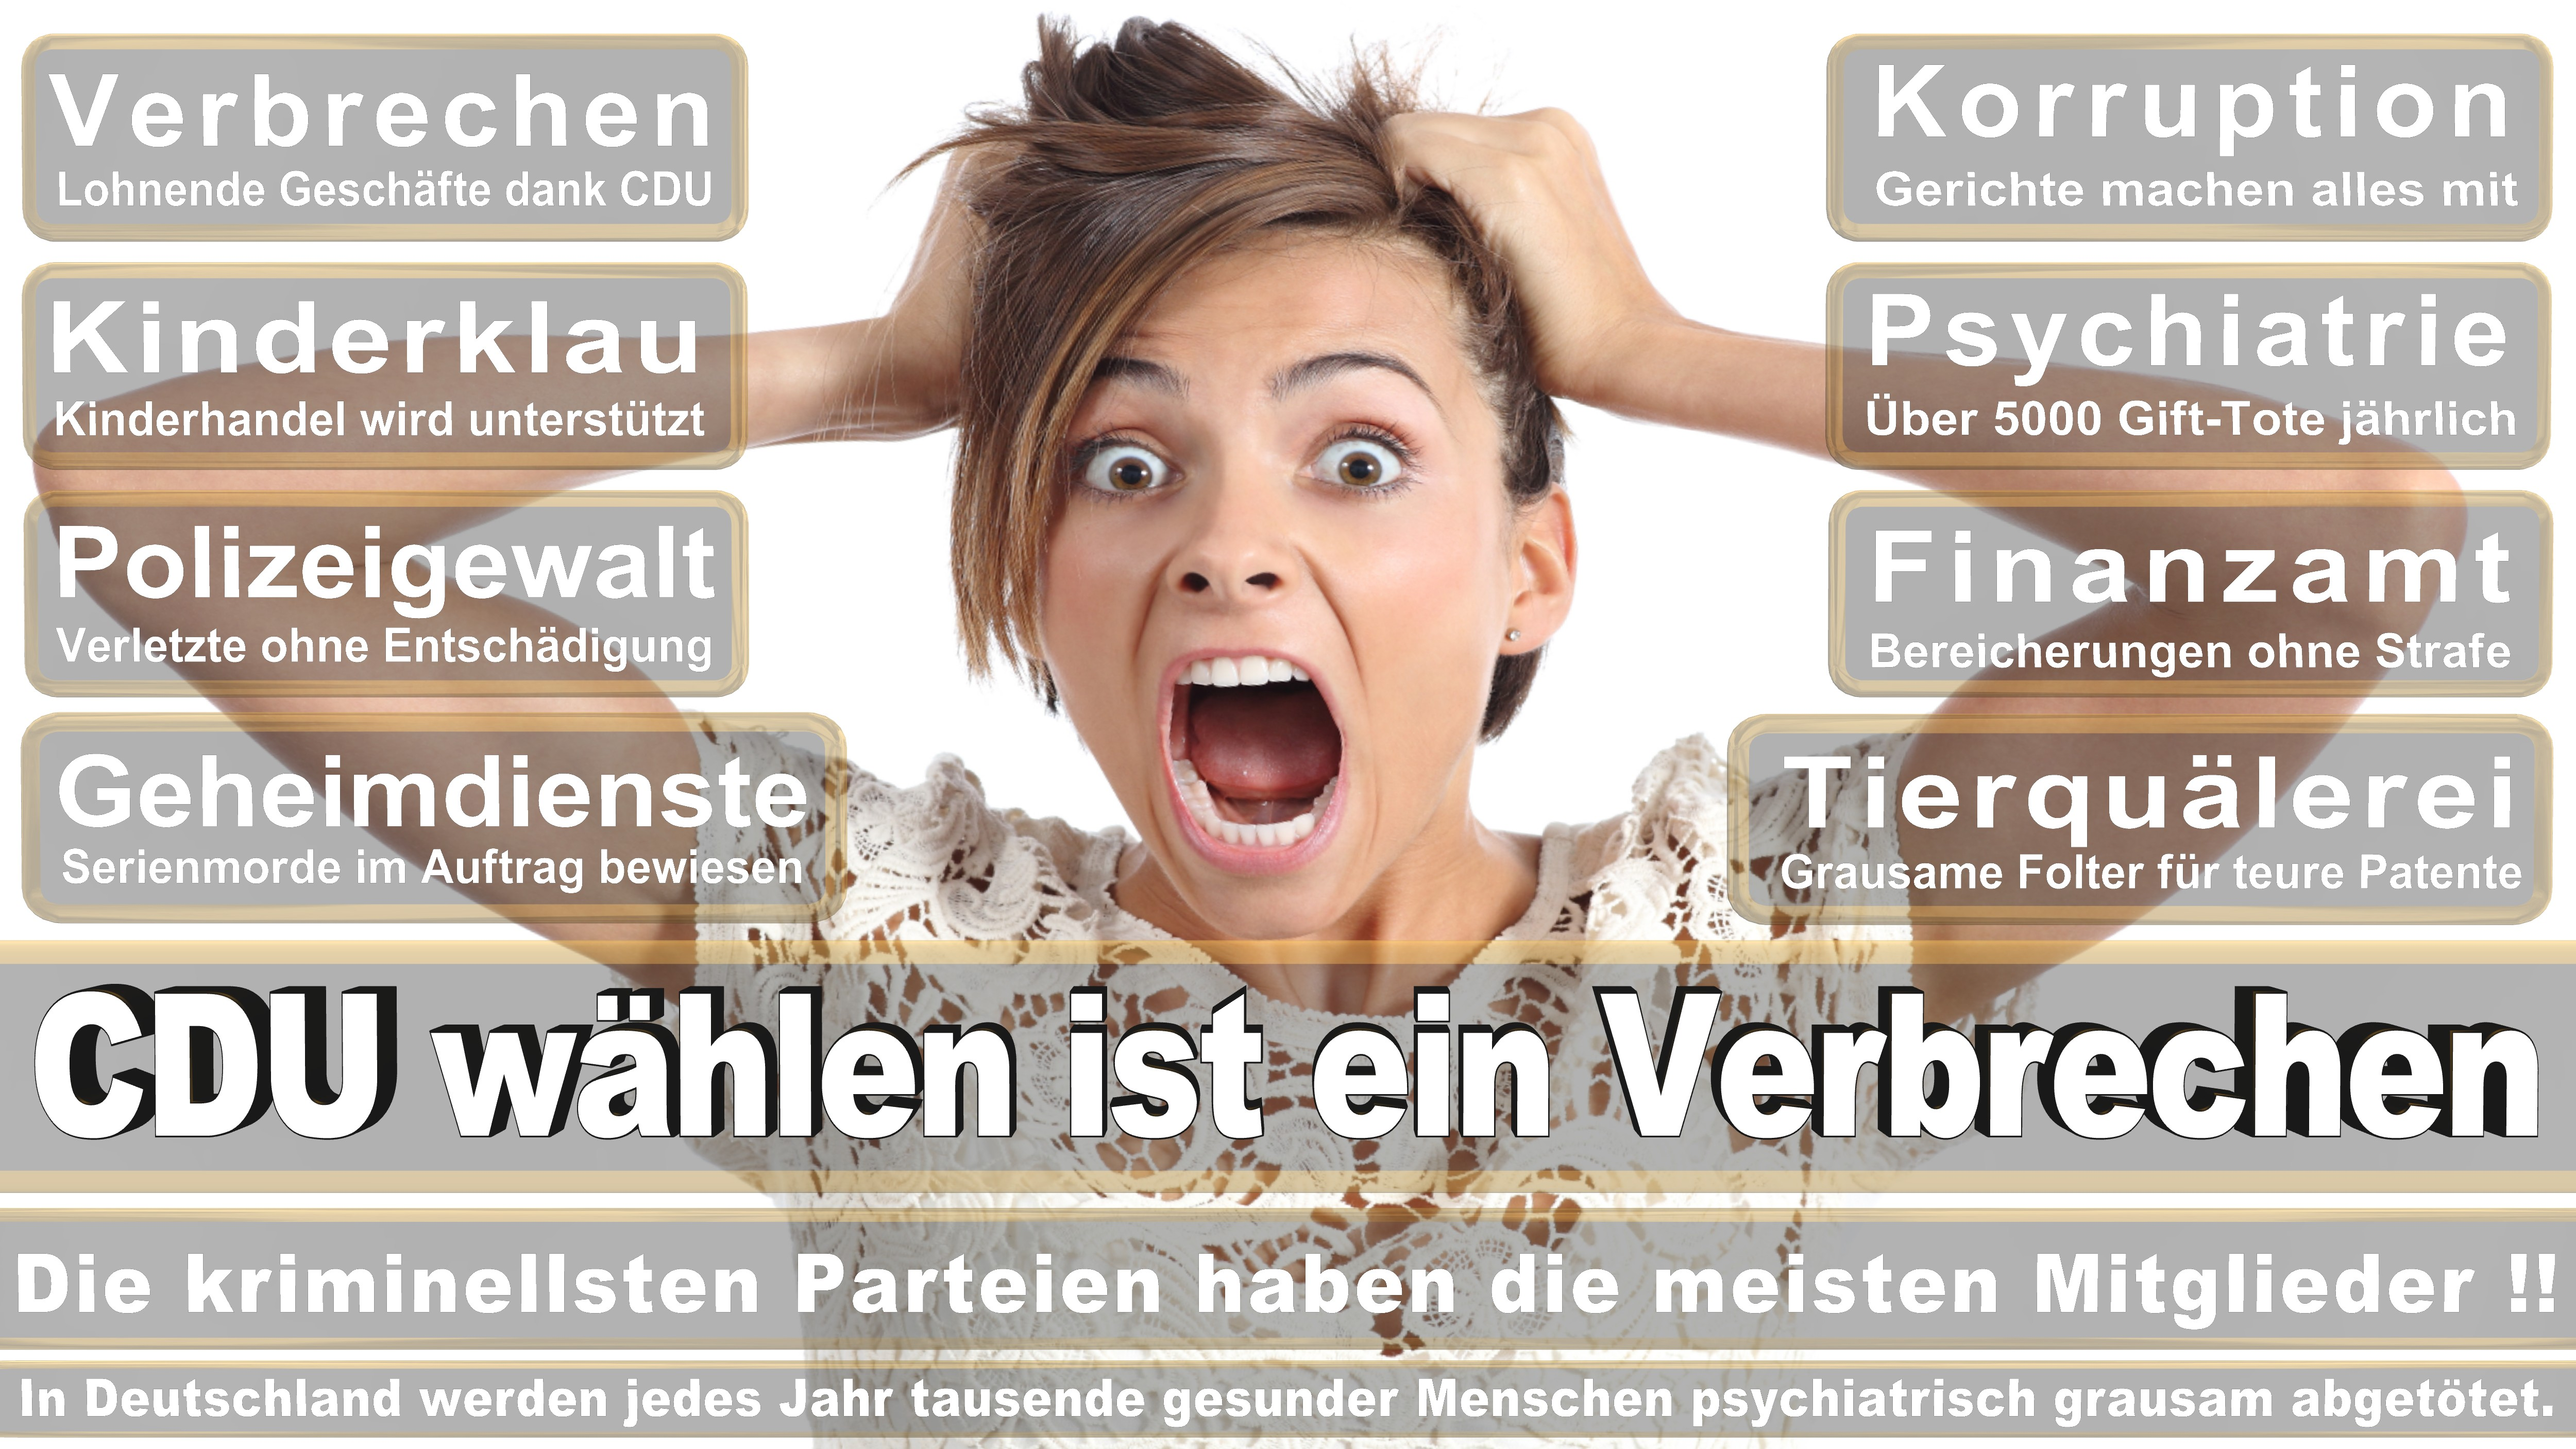 Backnang SPD Baden Württemberg Politiker Deutschland